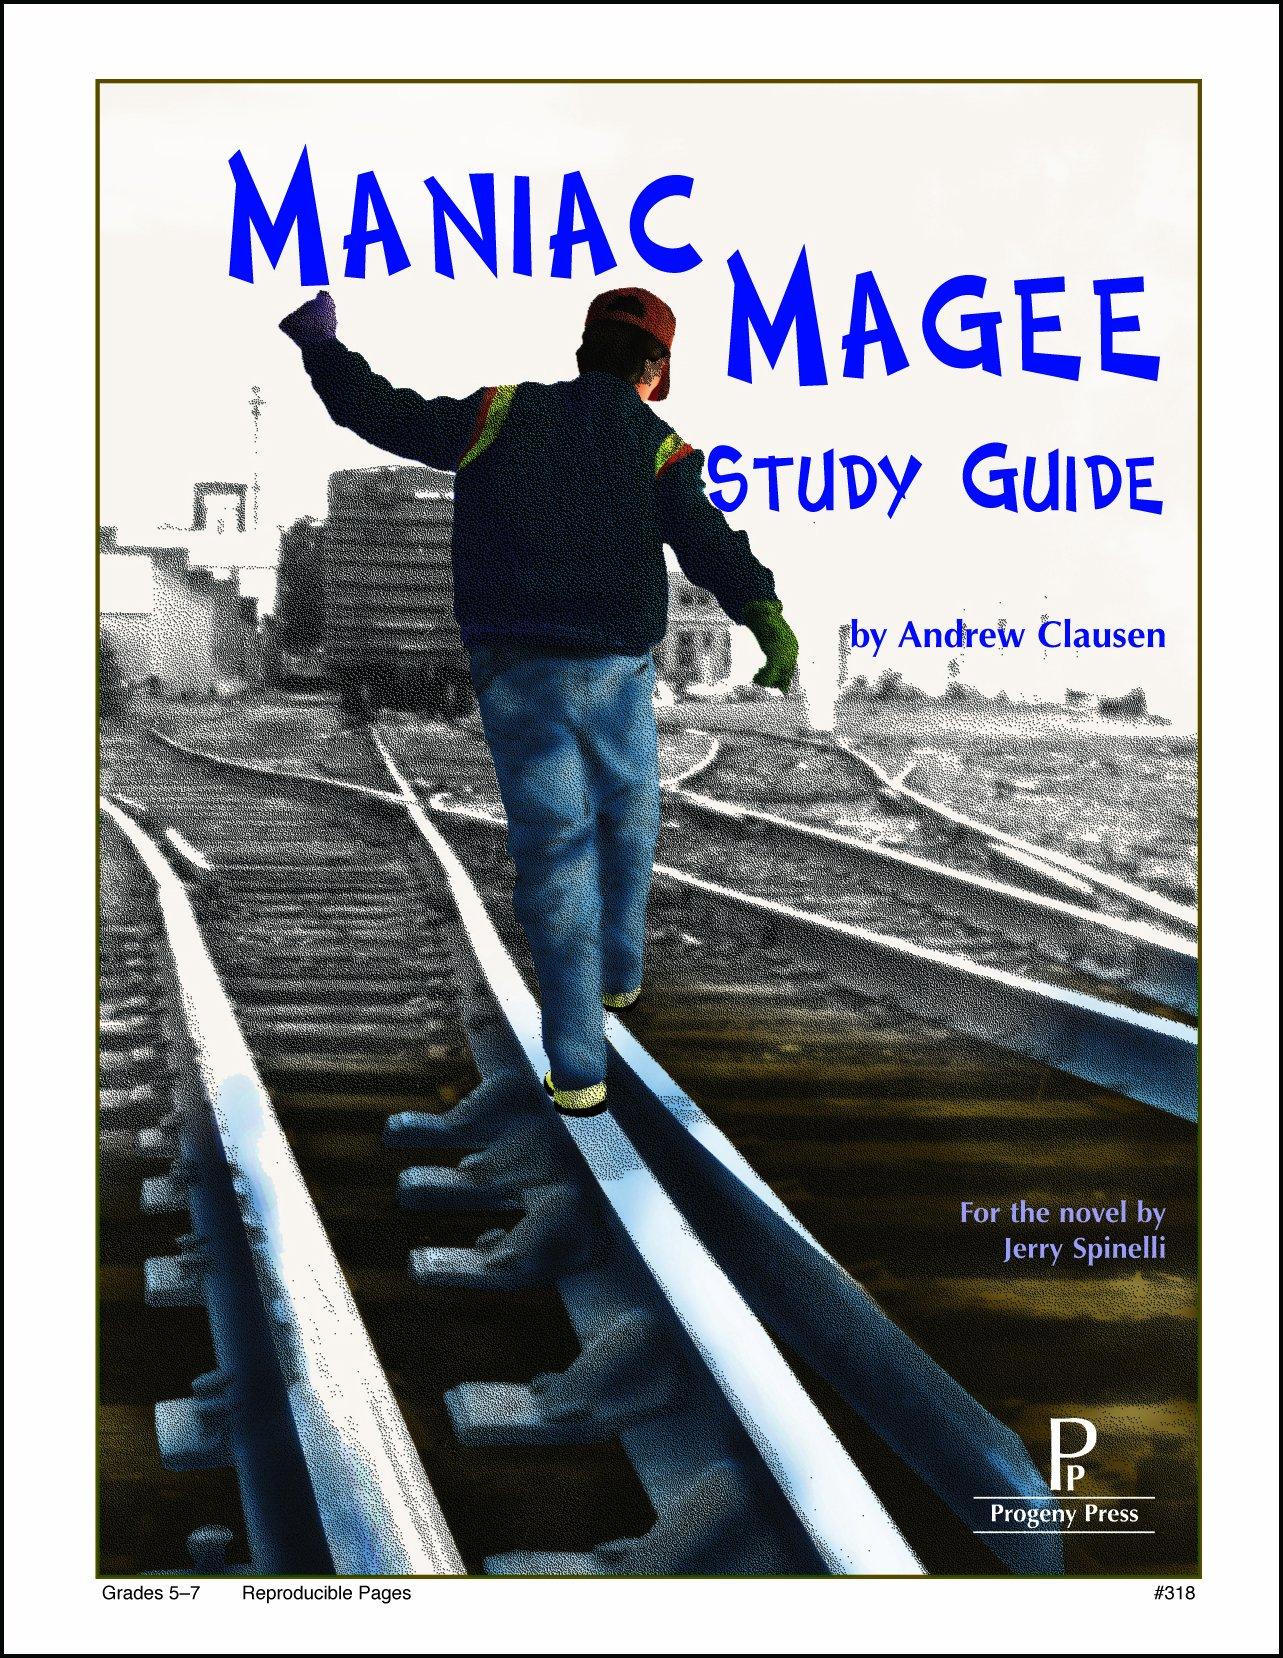 Maniac Magee Study Guide ebook